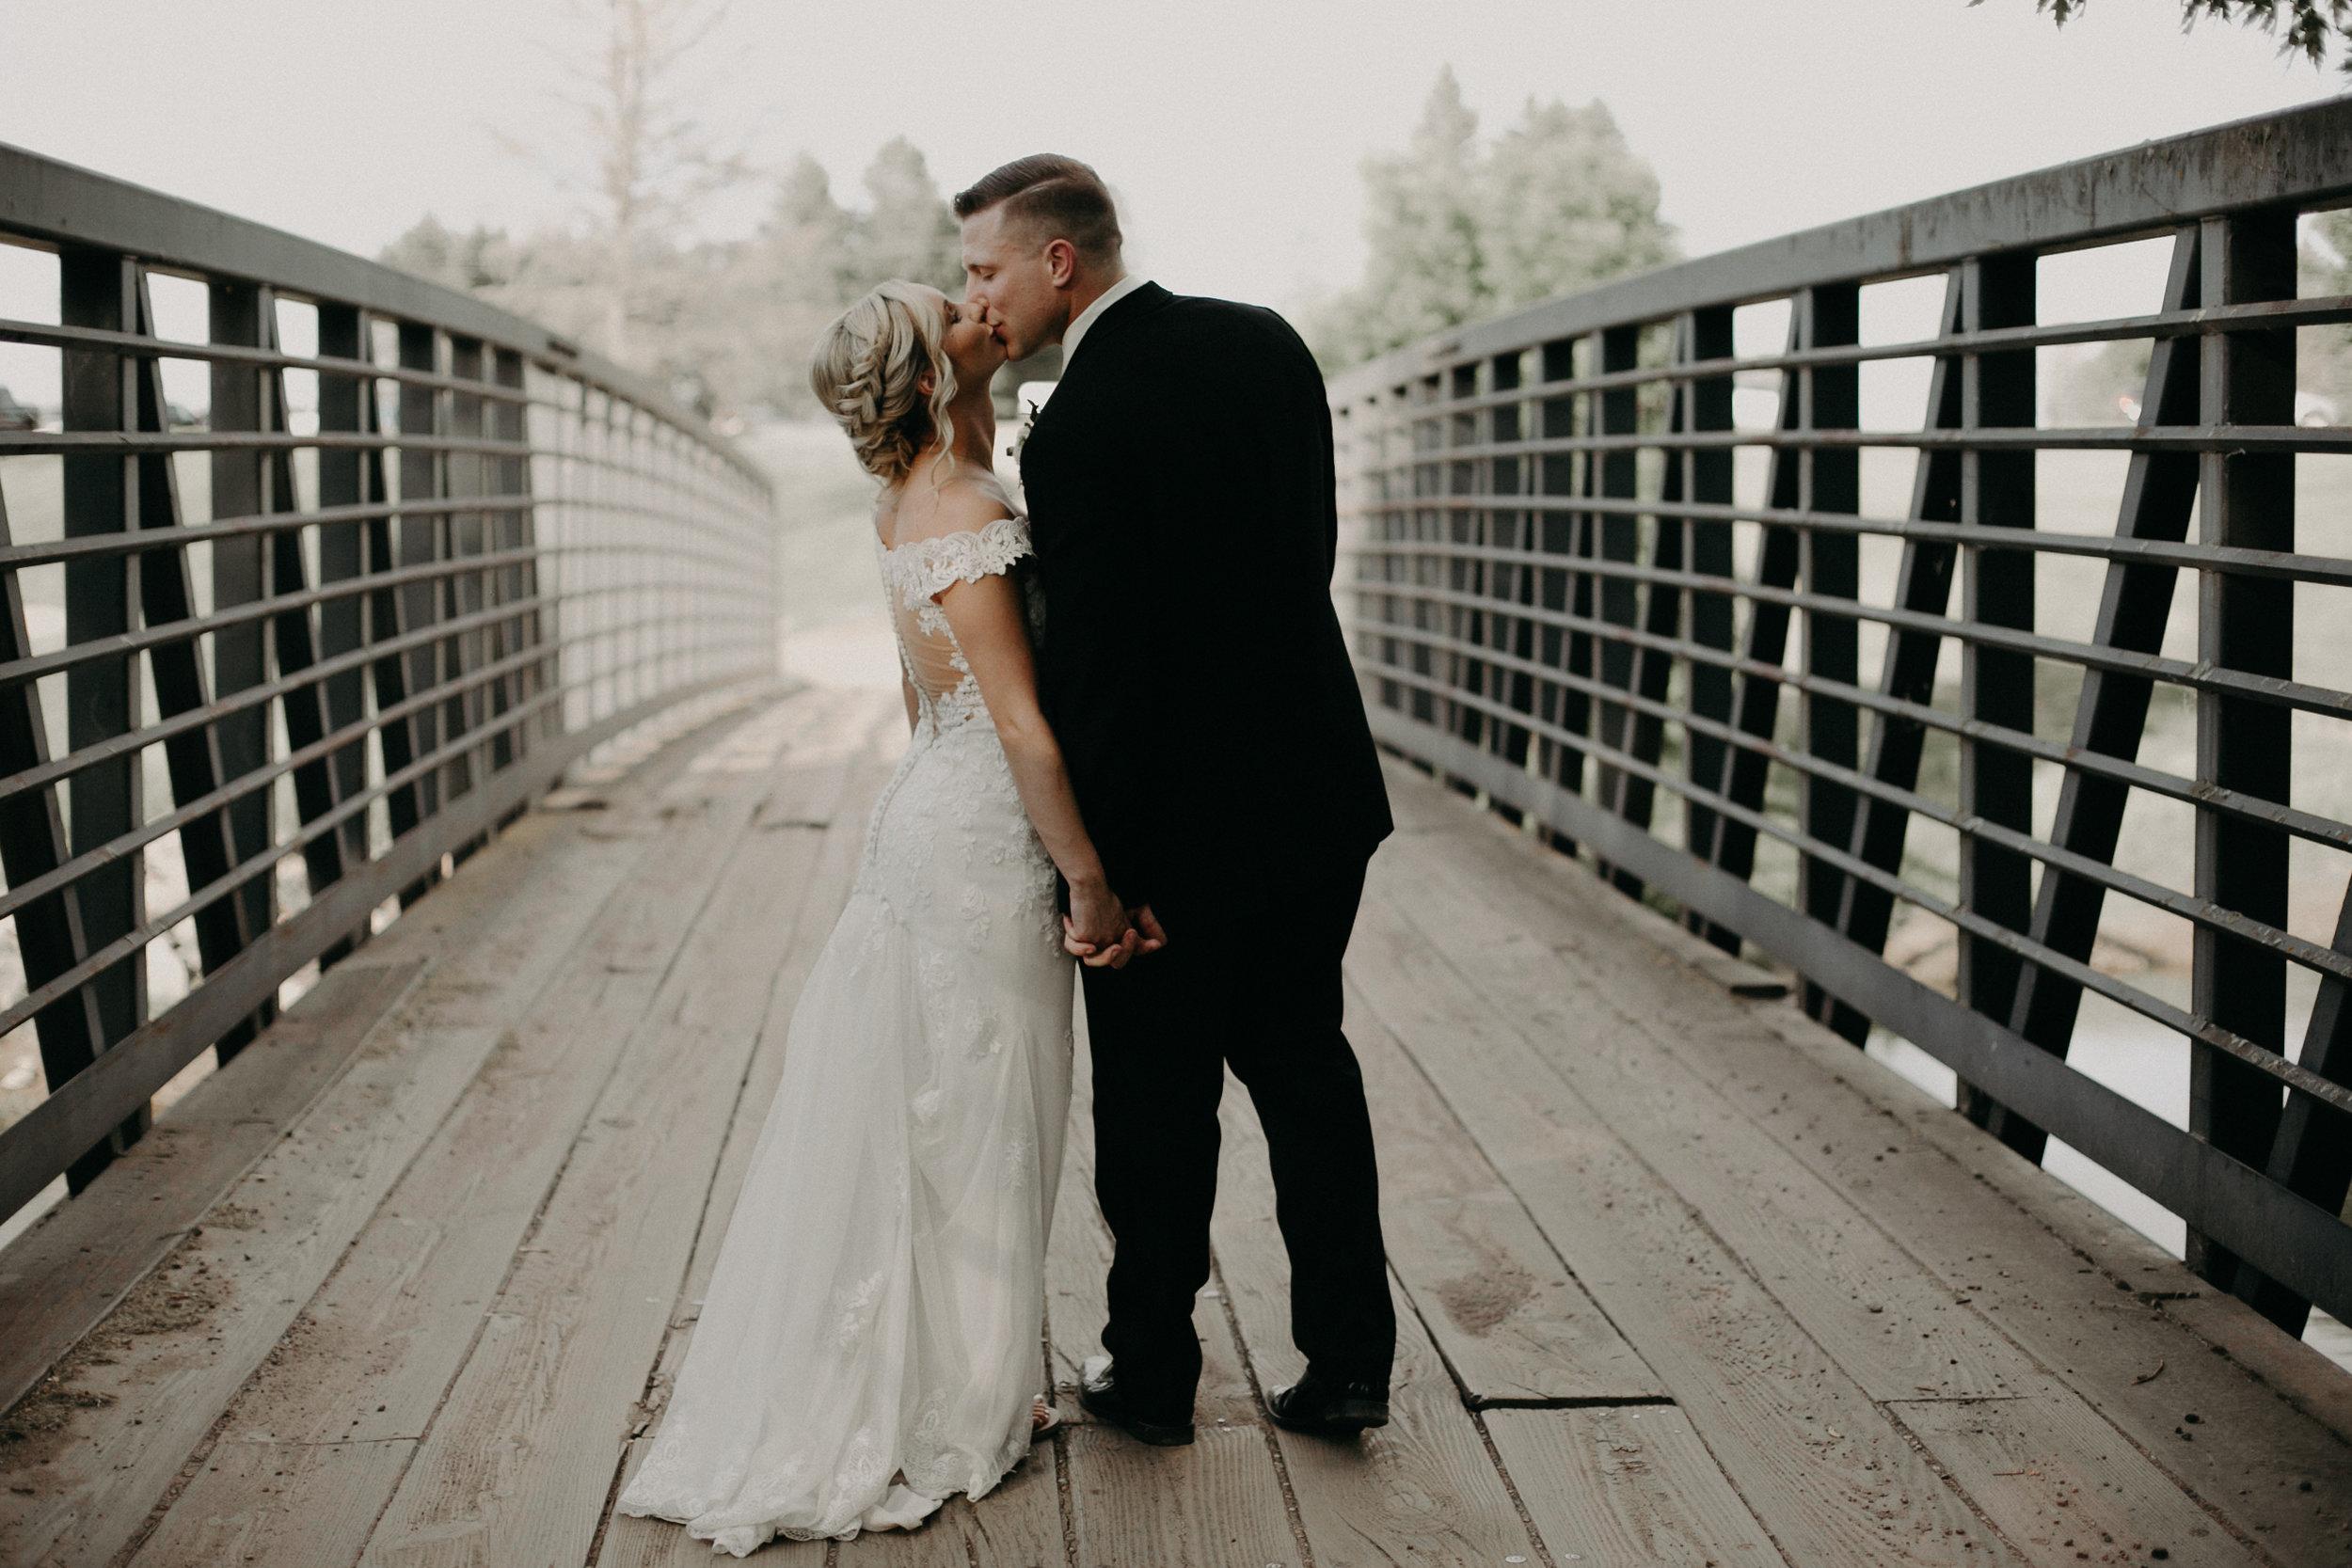 RiverEdge bride and groom portraits wedding photography Marshfield WI